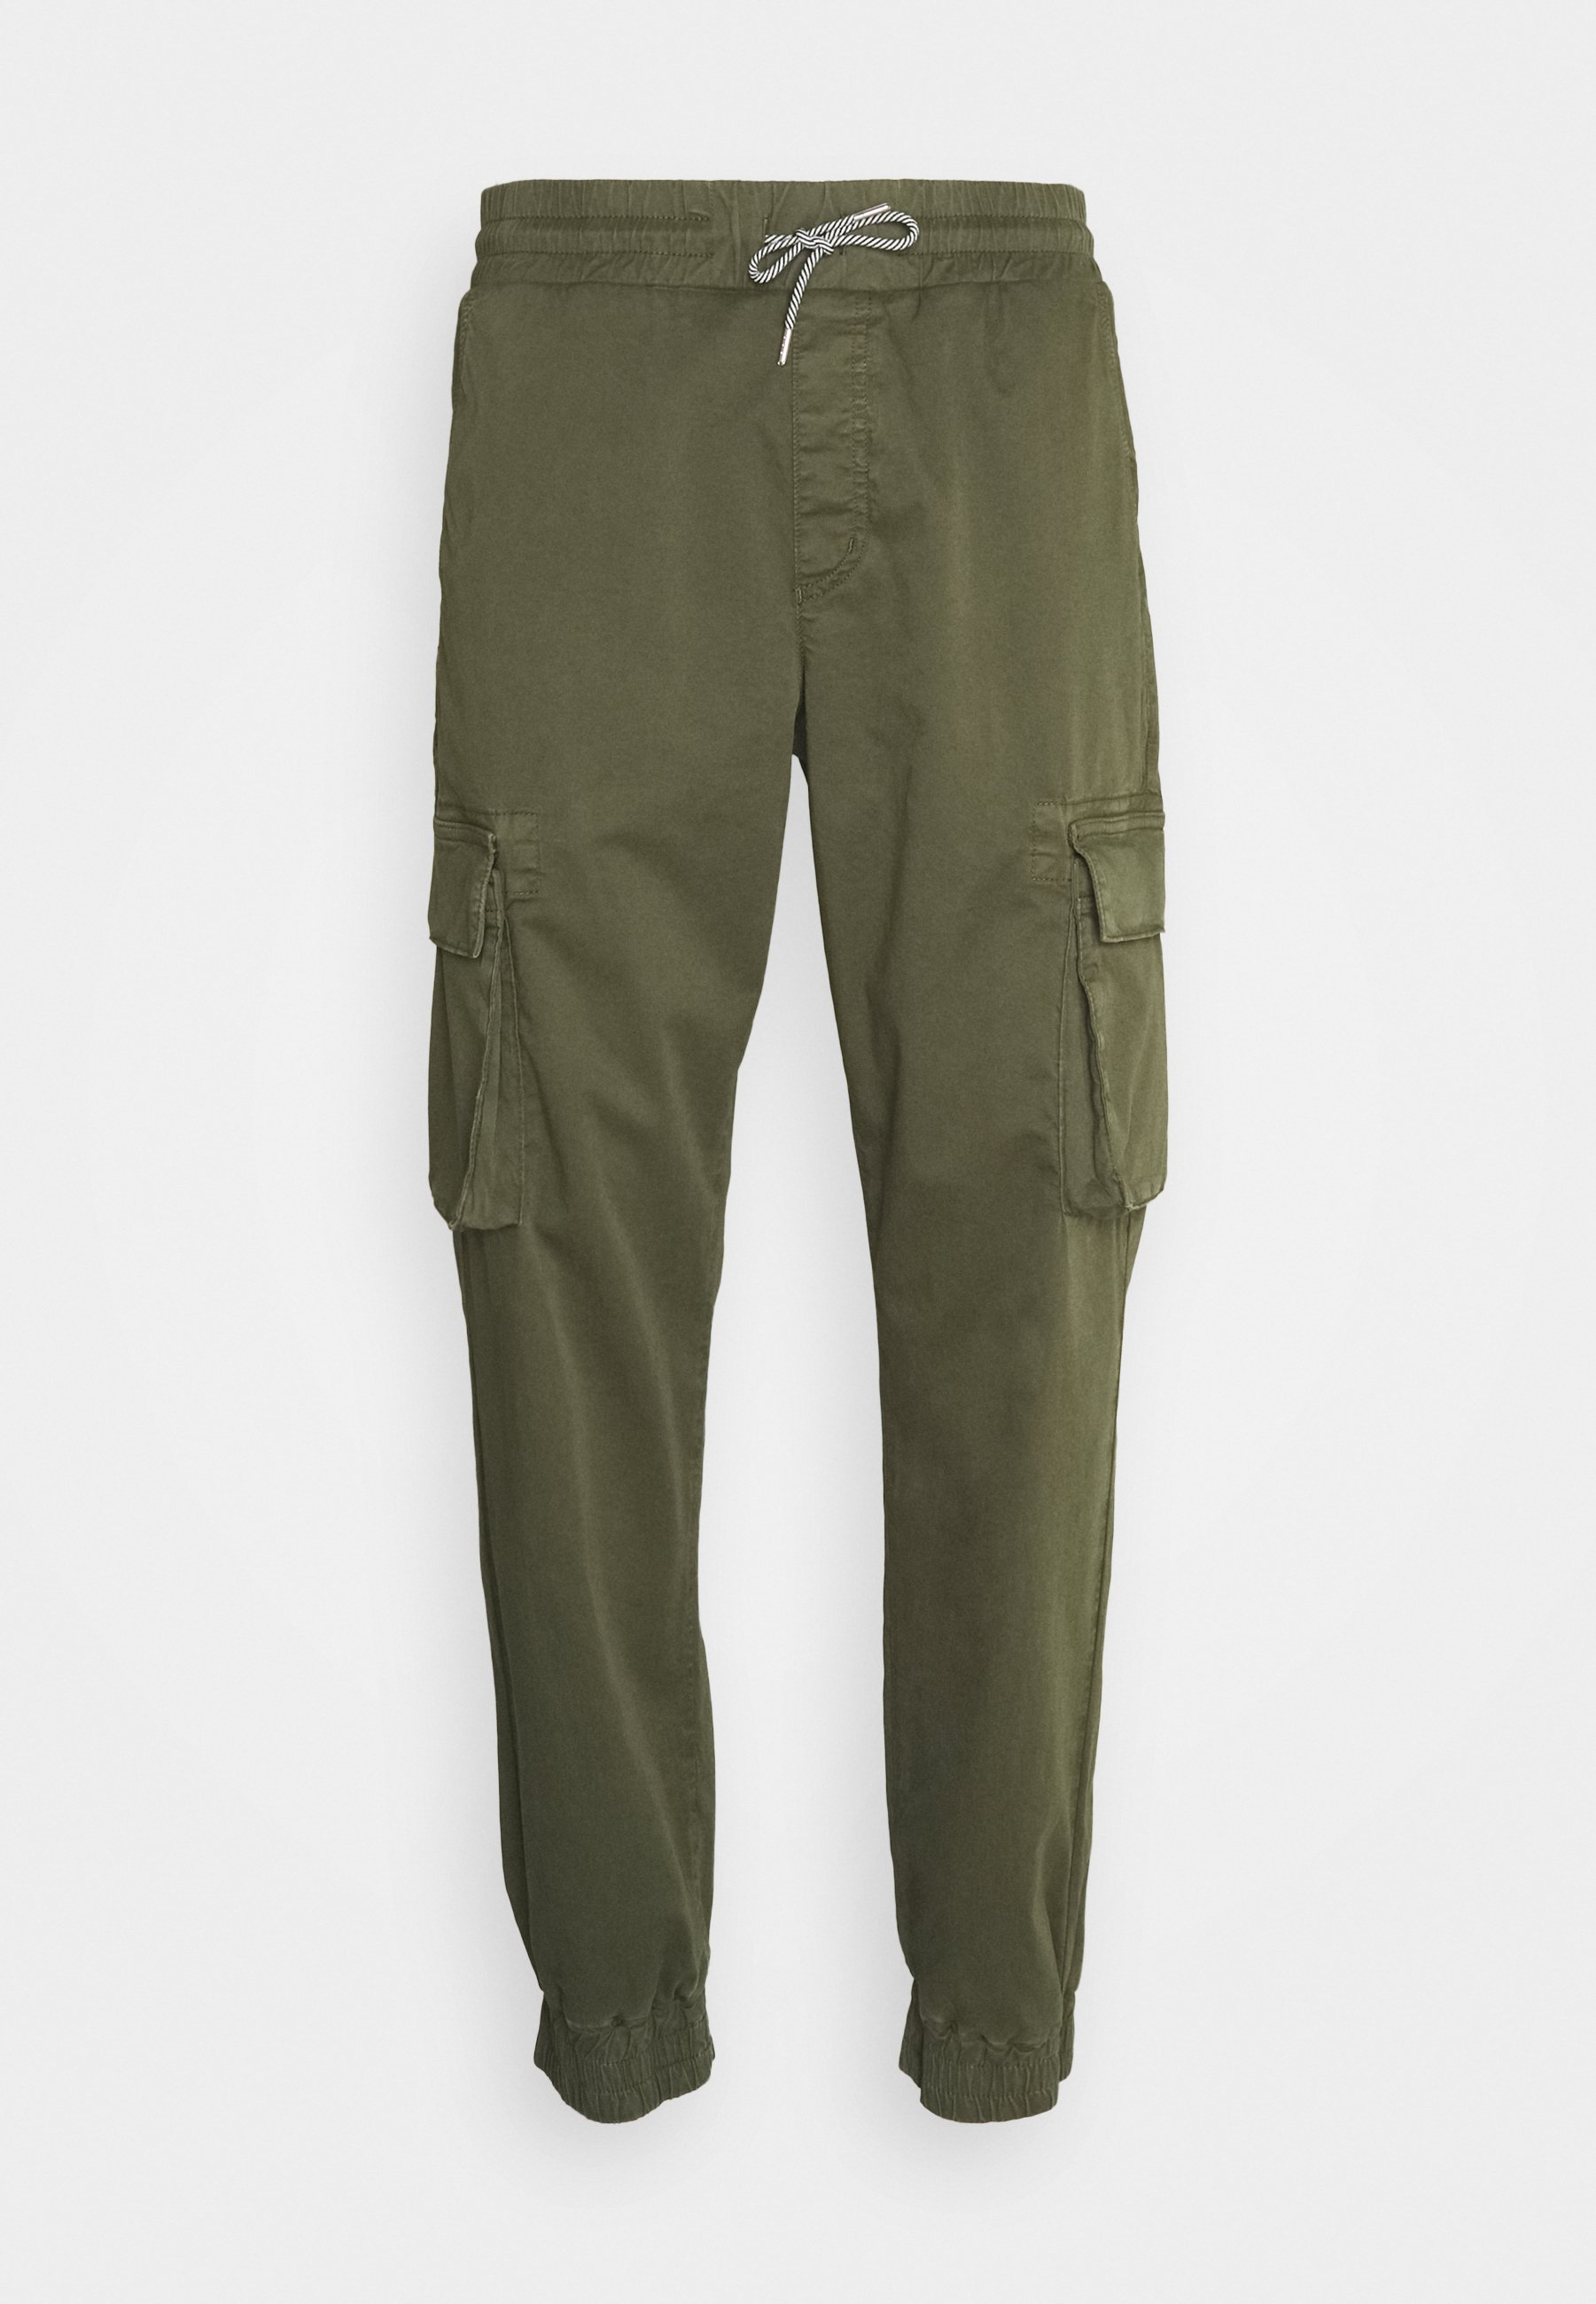 Homme CARGO PANTS - Pantalon cargo